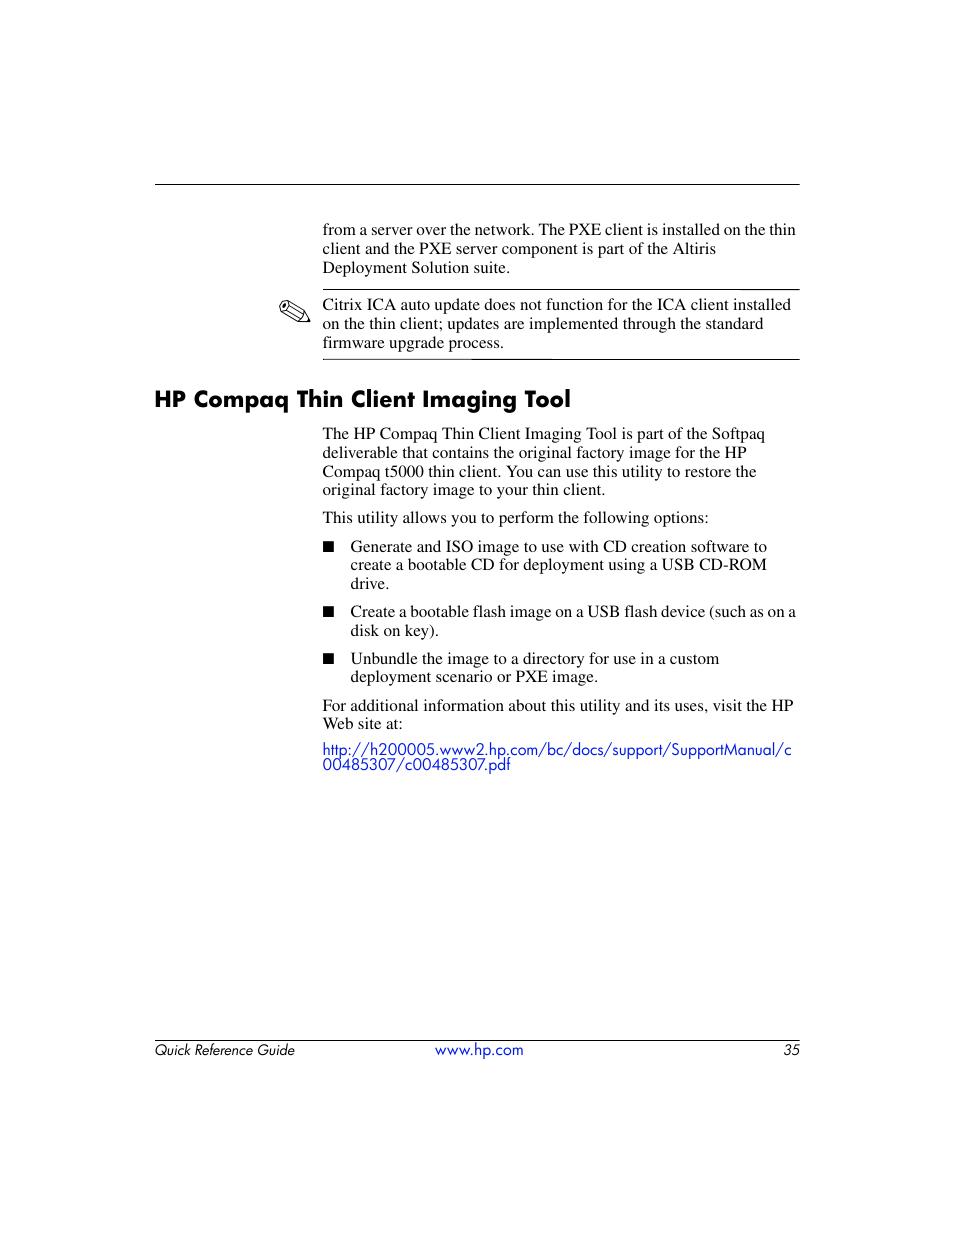 hp compaq thin client imaging tool hp t5000 user manual page 39 41 rh manualsdir com HP T5000 Image HP Compaq T5700 Thin Client